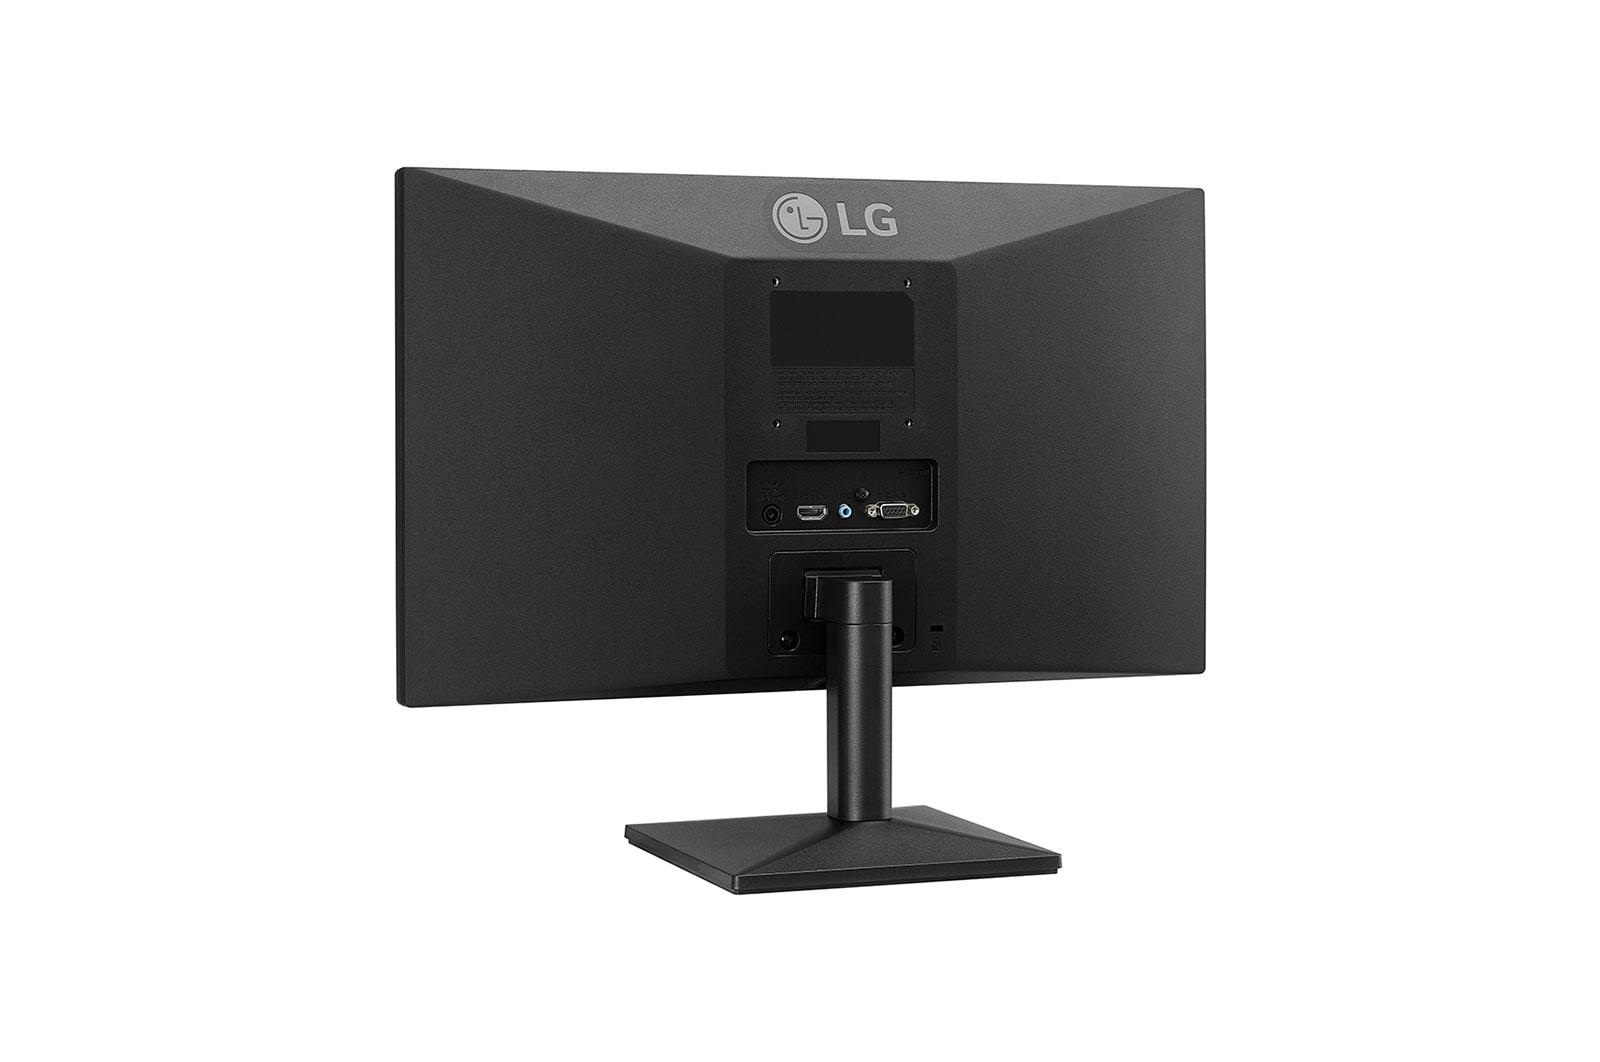 https://www.lg.com/es/images/monitores/md06033316/gallery/20MK400H-B_Desktop-Zoom_07.jpg